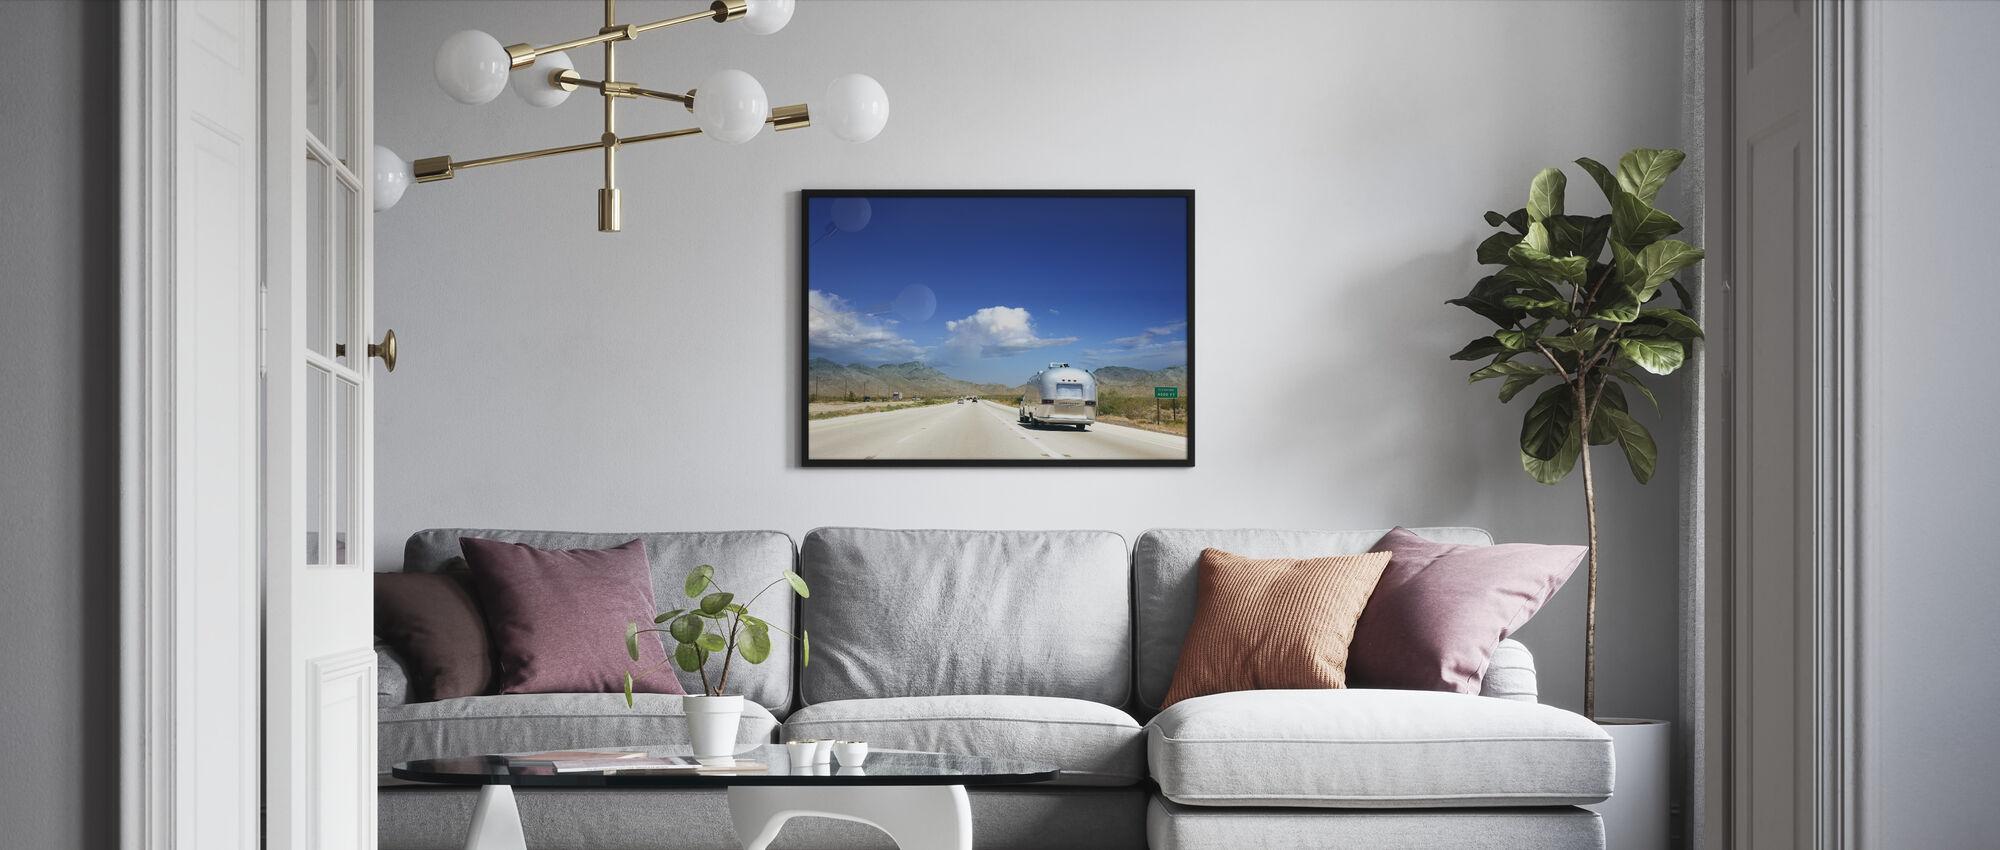 Caravan in Nevada, USA - Framed print - Living Room